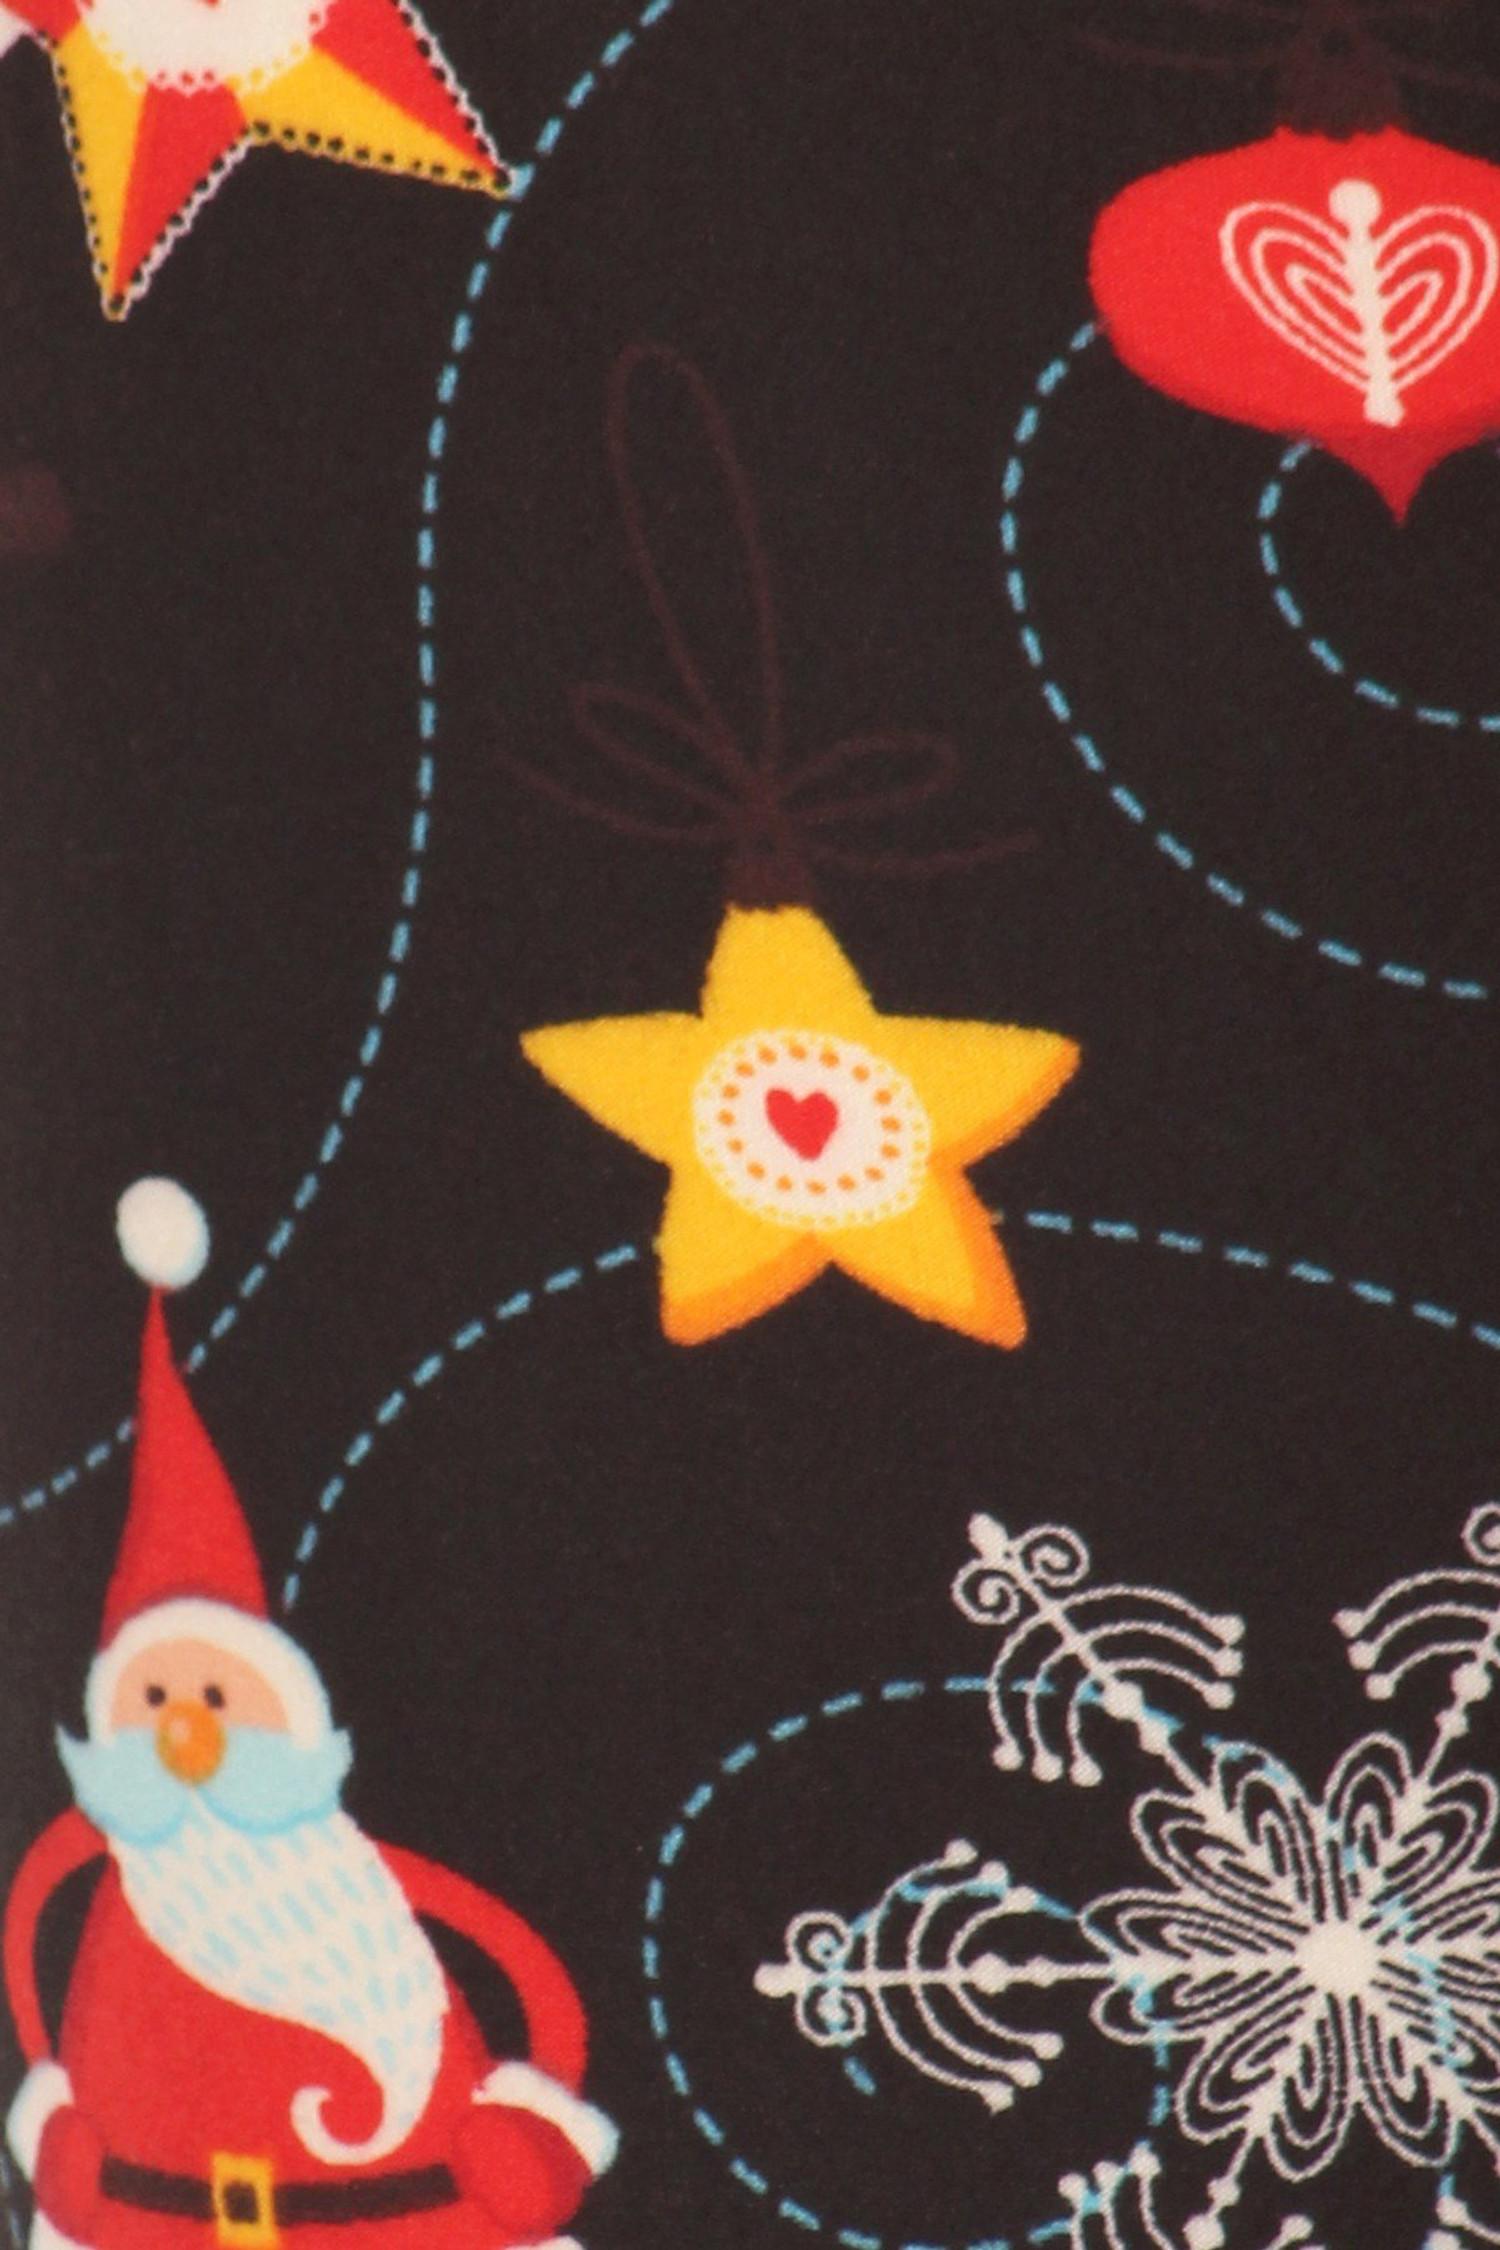 Brushed Santa's Wonderland Christmas Leggings